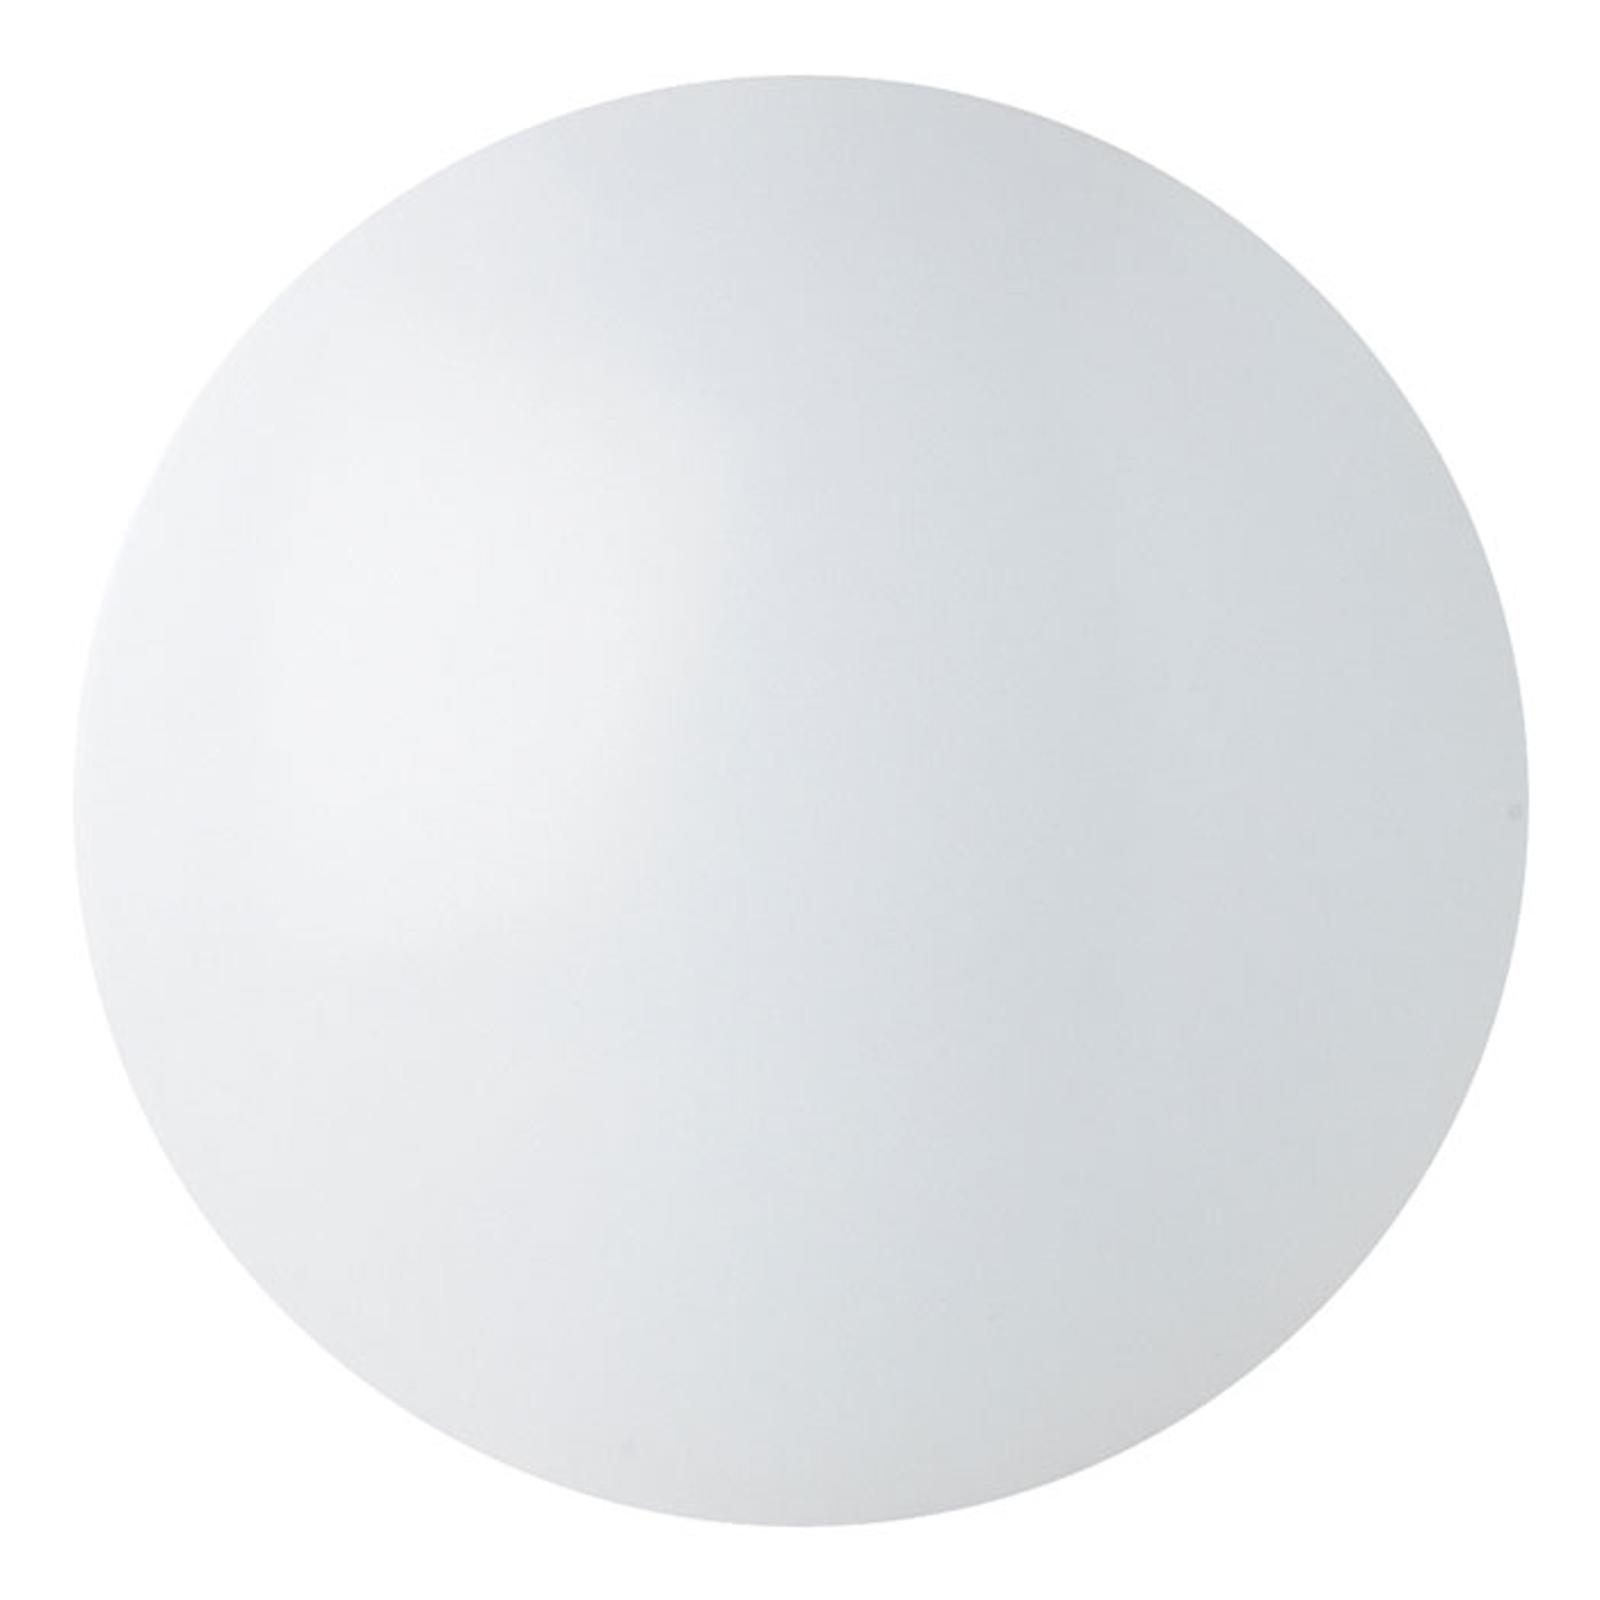 Renzo - plafonnier LED rond IP44, blanc chaud